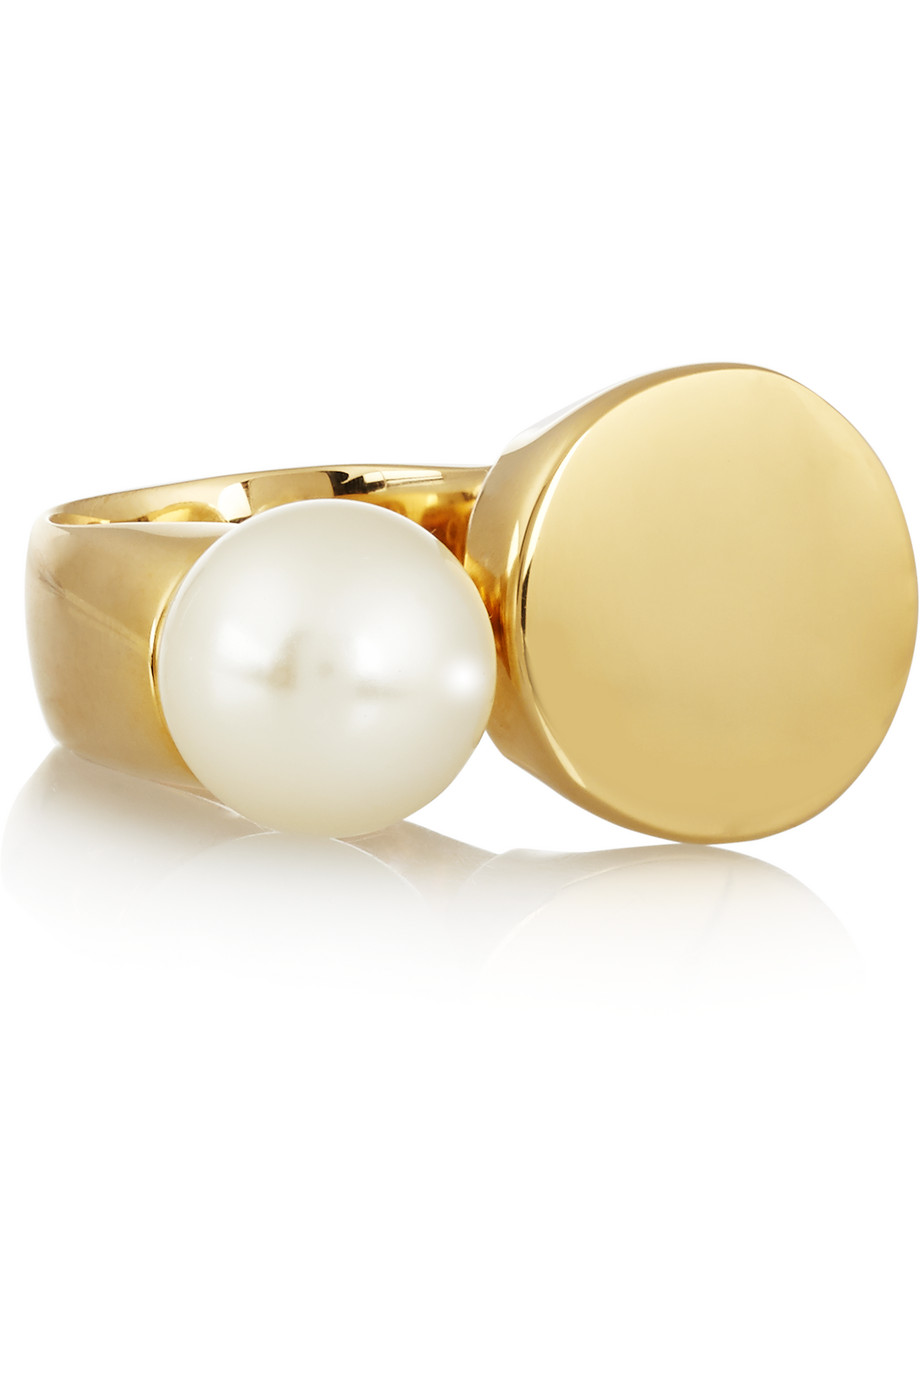 Chloé Darcey Gold-Tone Swarovski Pearl Ring, Gold/White, Women's, Size: 52